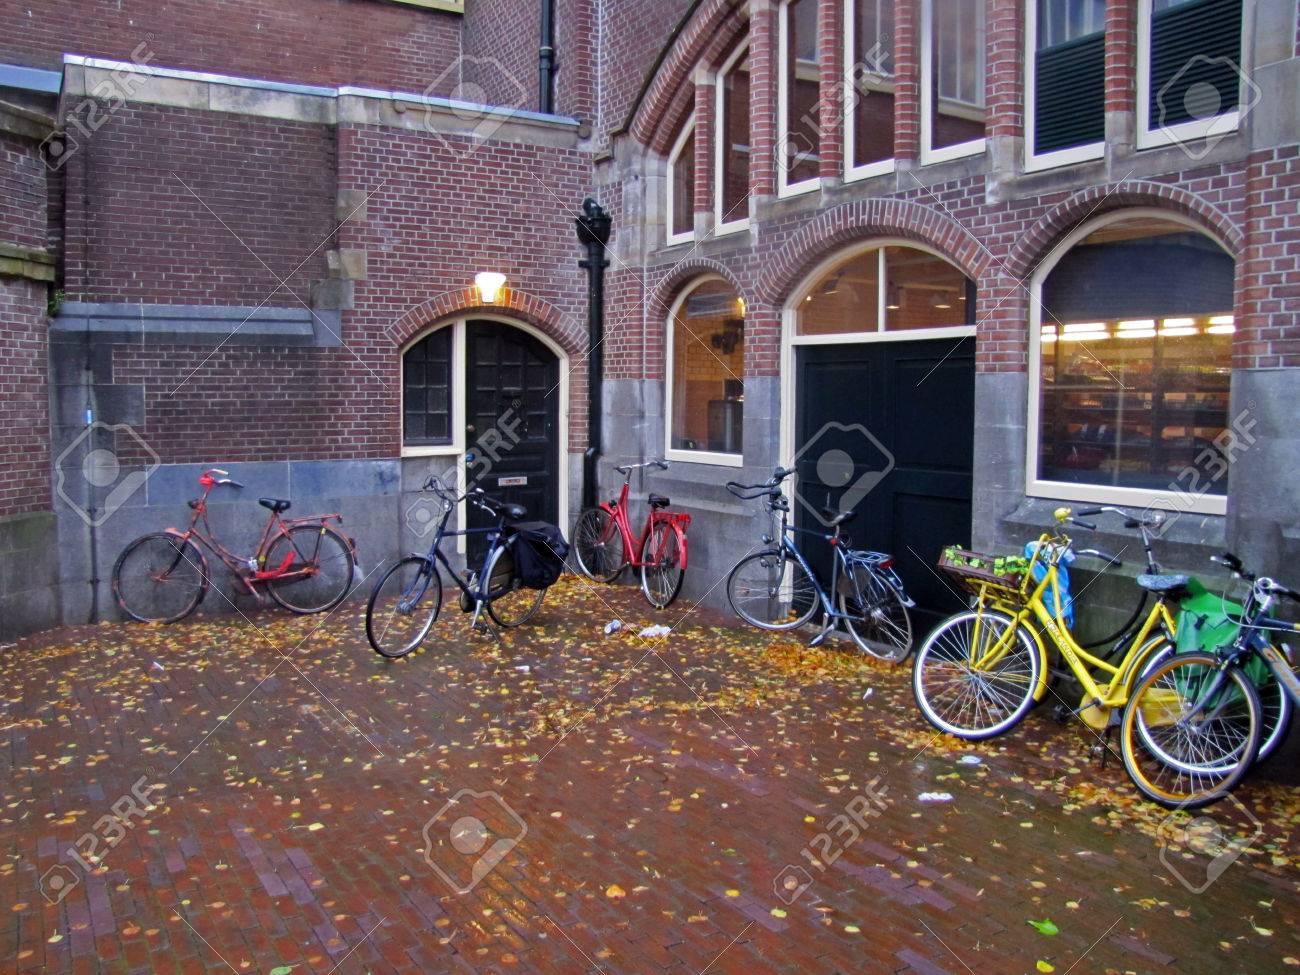 Haarlem train station - 34359775